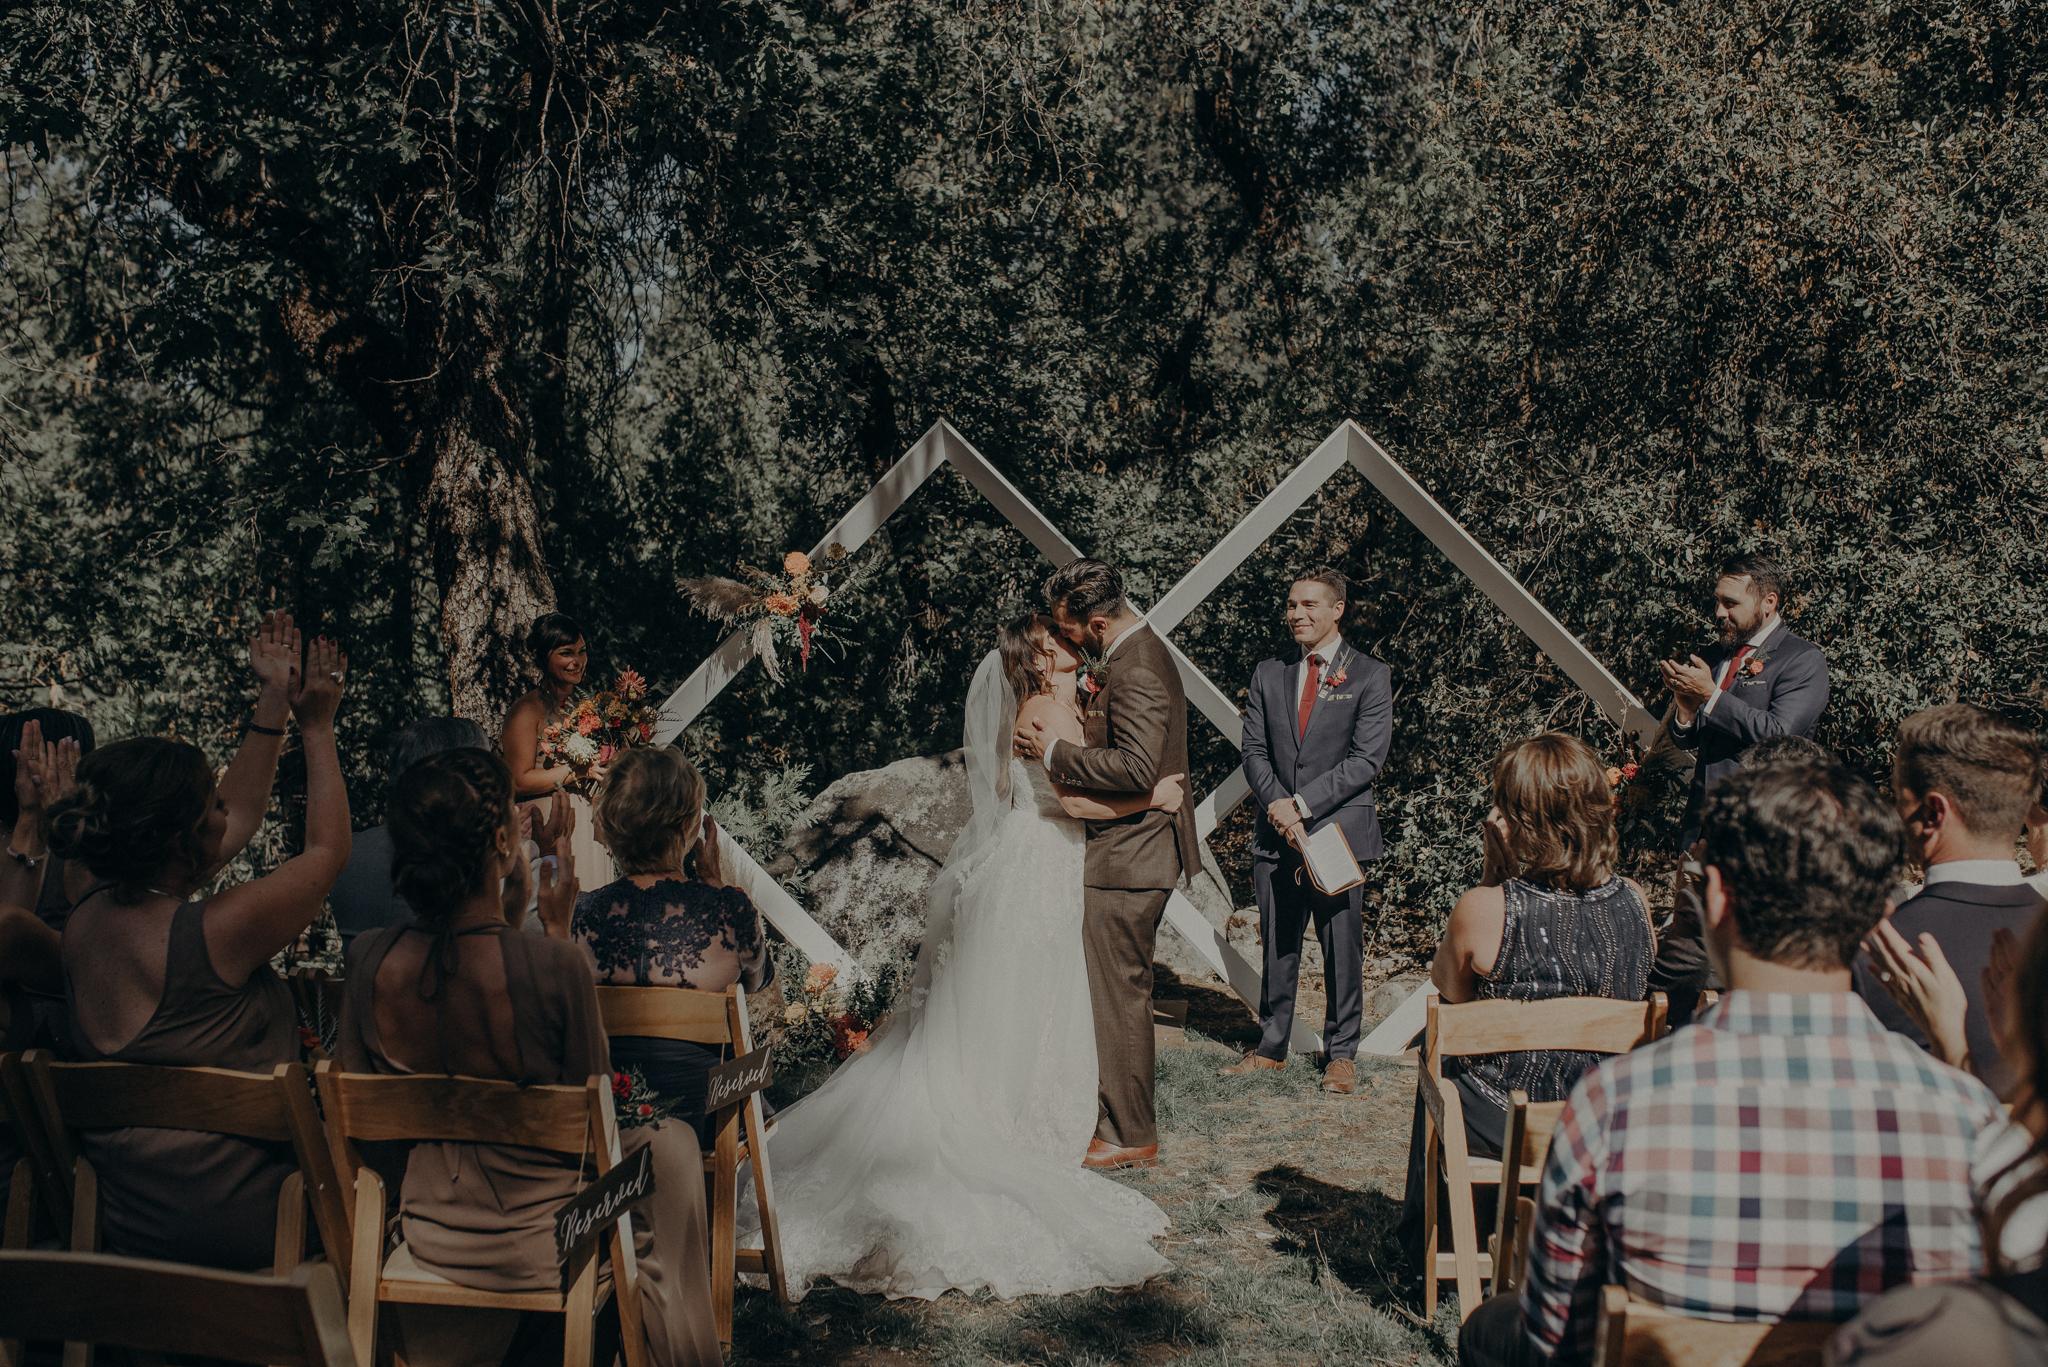 Yosemite Elopement Photographer - Evergreen Lodge Wedding Photographer - IsaiahAndTaylor.com-102.jpg